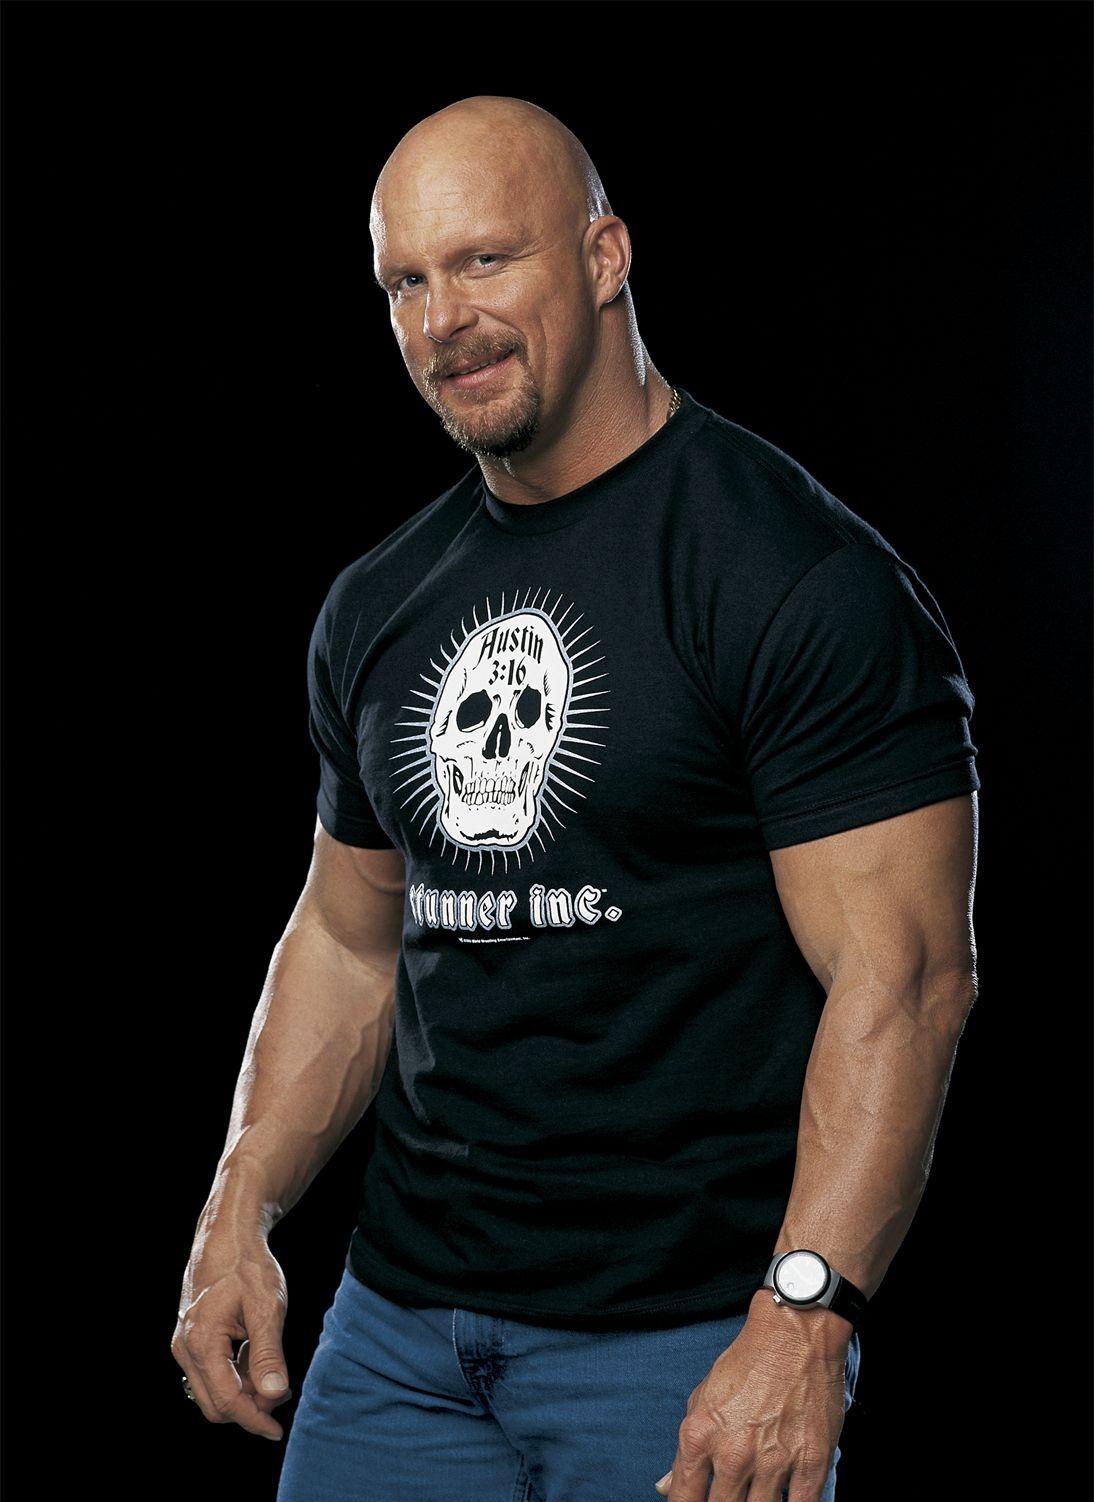 Stone Cold Steve Austin : Stone cold wrestling raw smack down ecw wwe divas